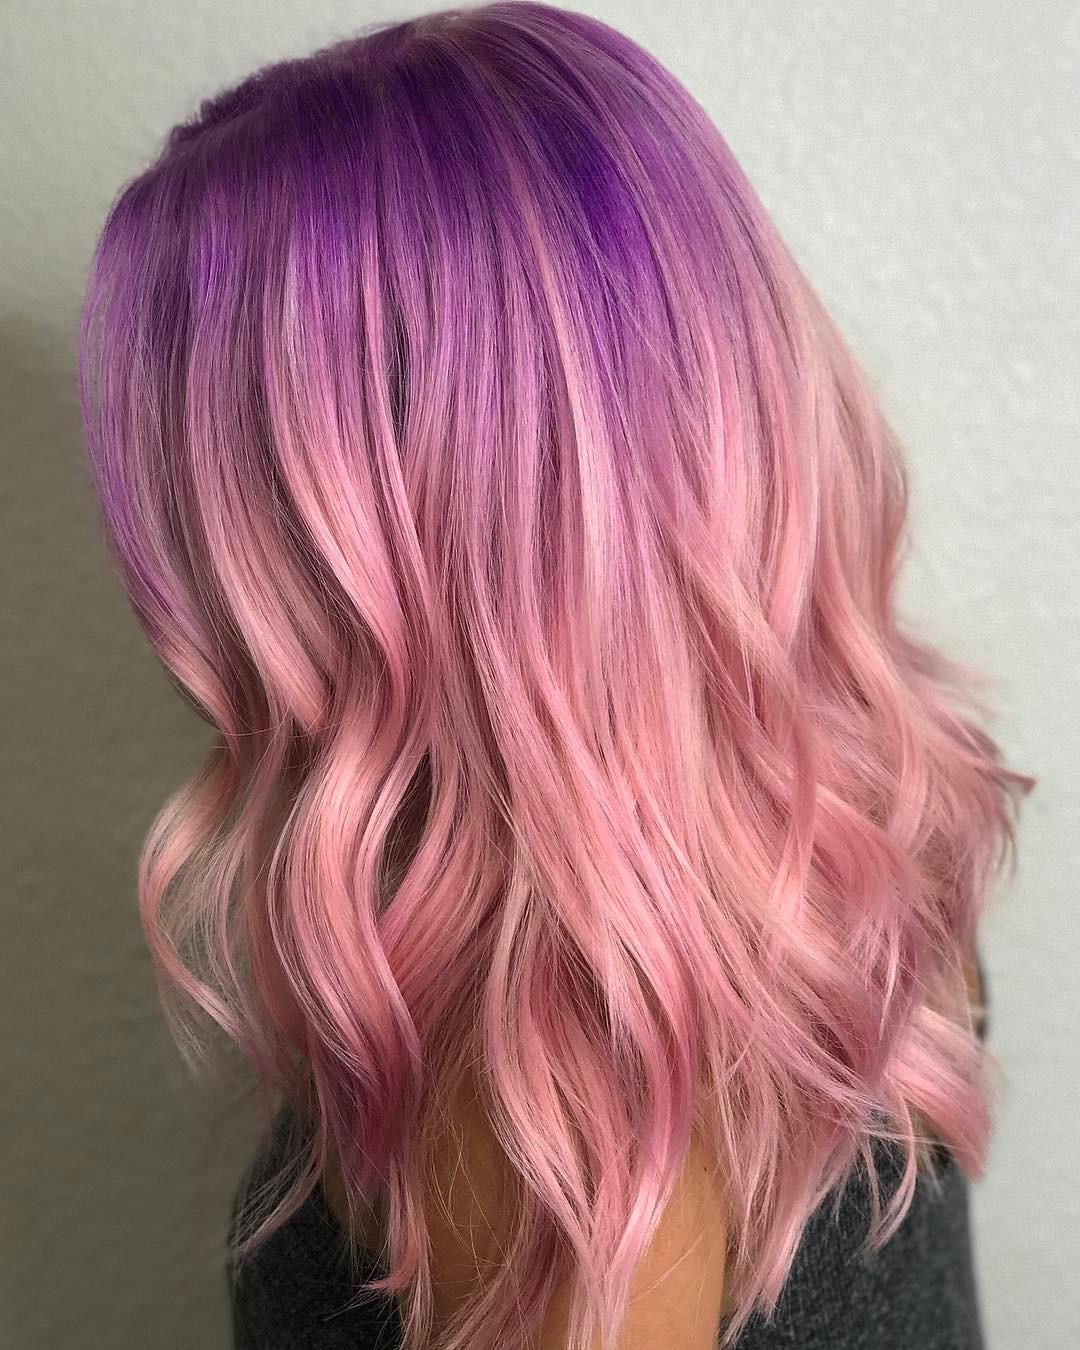 устаревшие тенденции волос фото 3